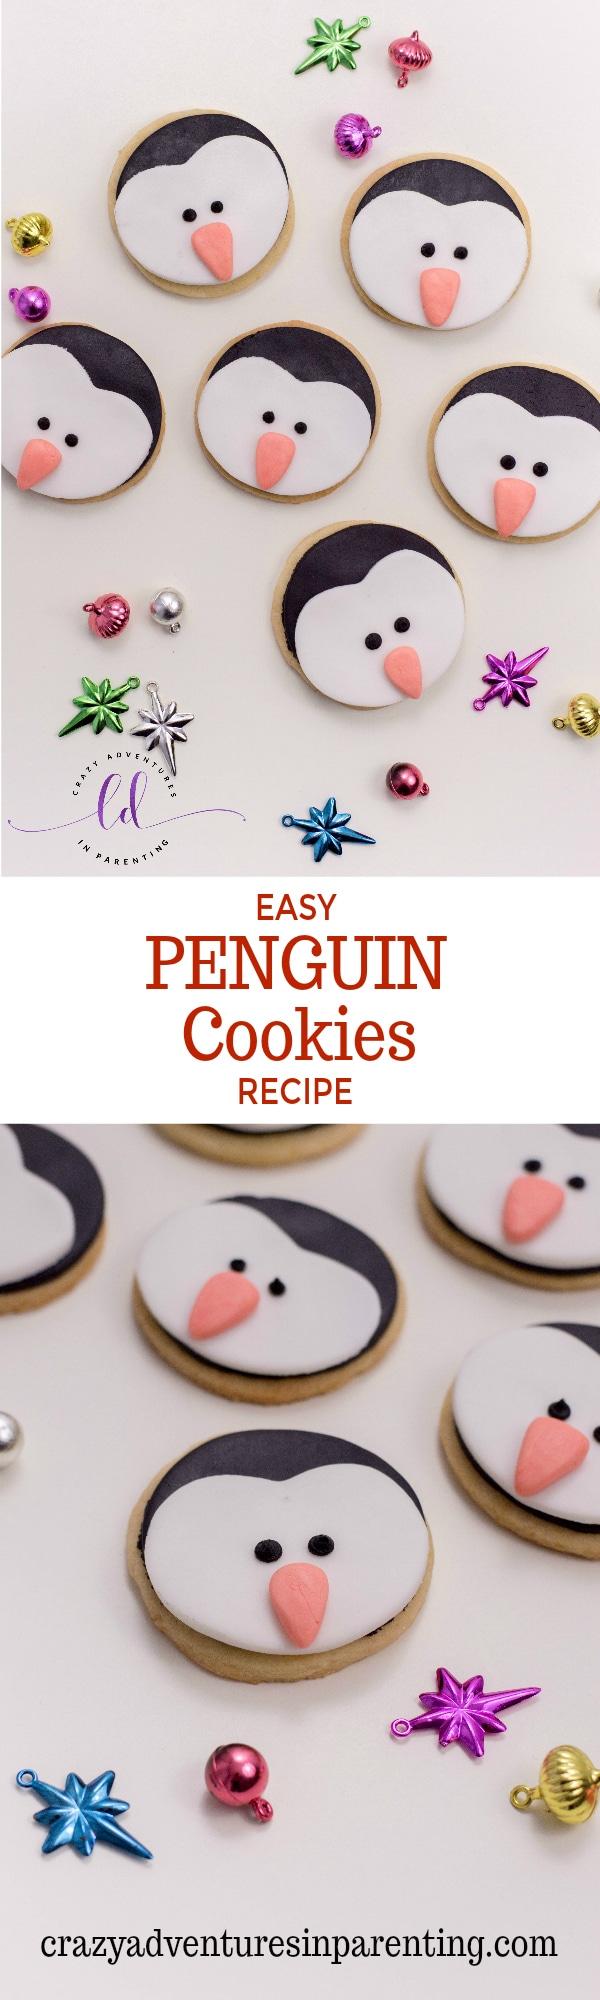 Easy Penguin Cookies Recipe